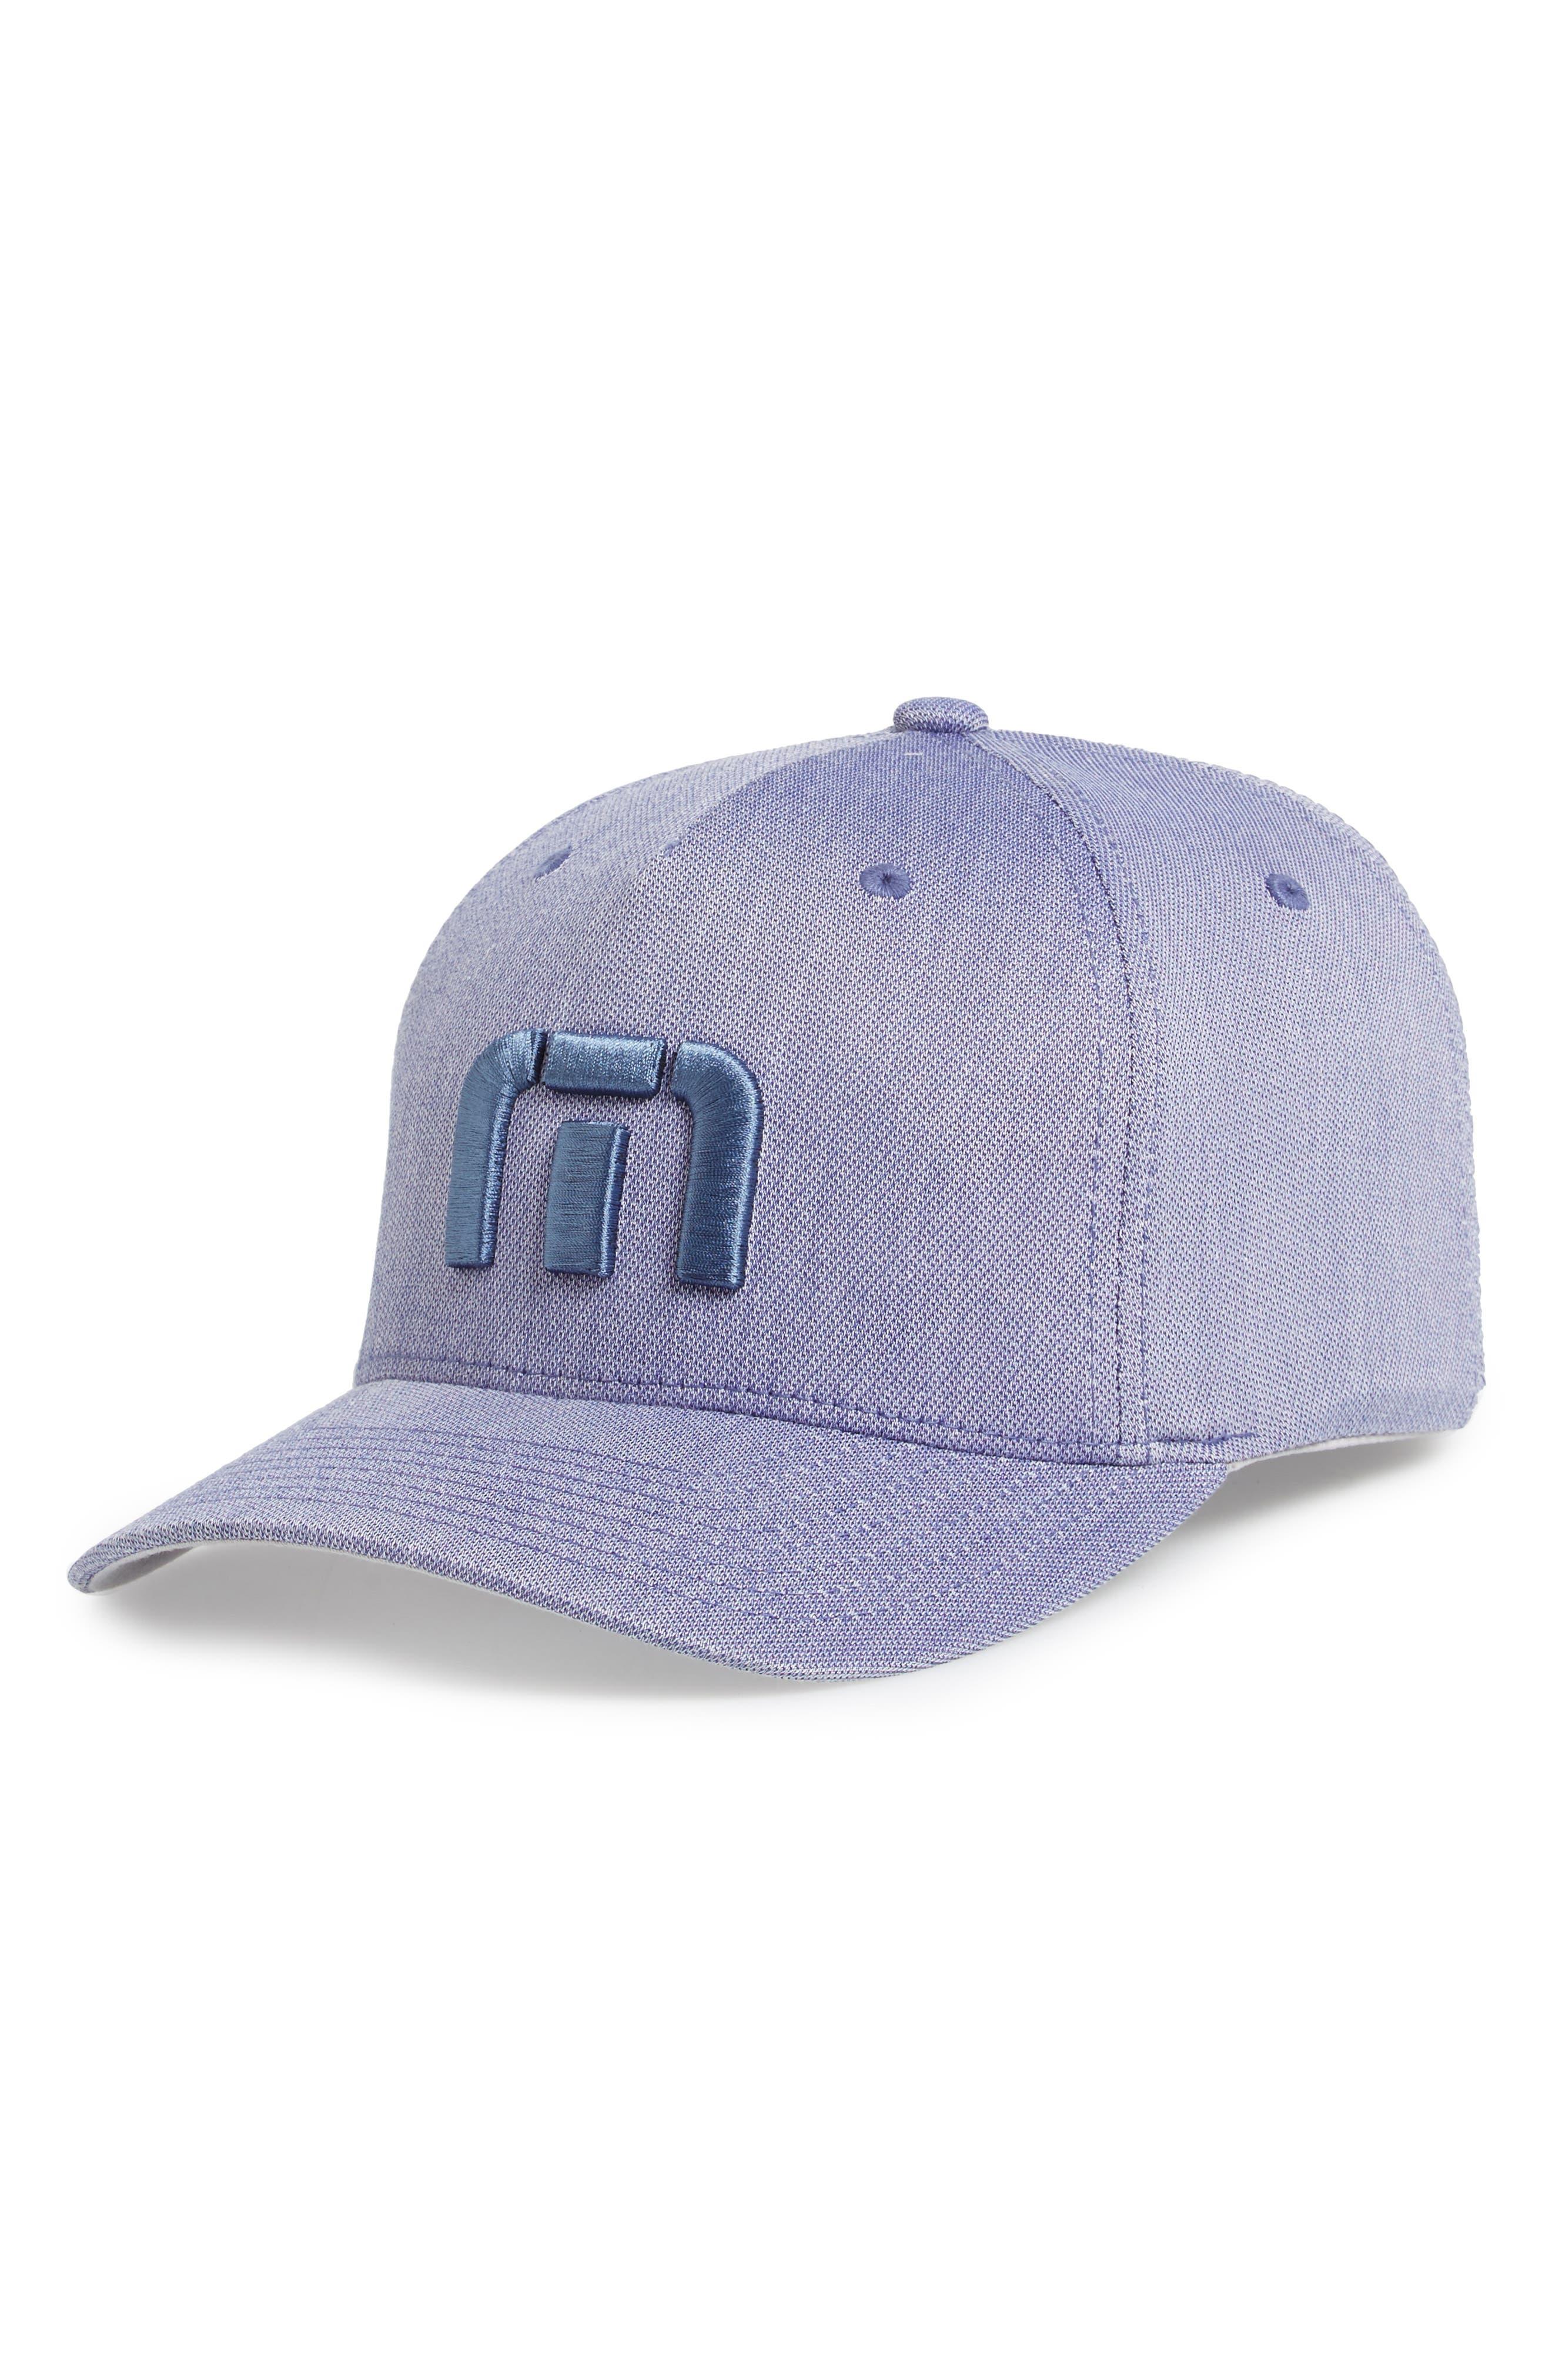 Van Dyke Flex Fit Baseball Cap,                             Main thumbnail 1, color,                             Heather Blue